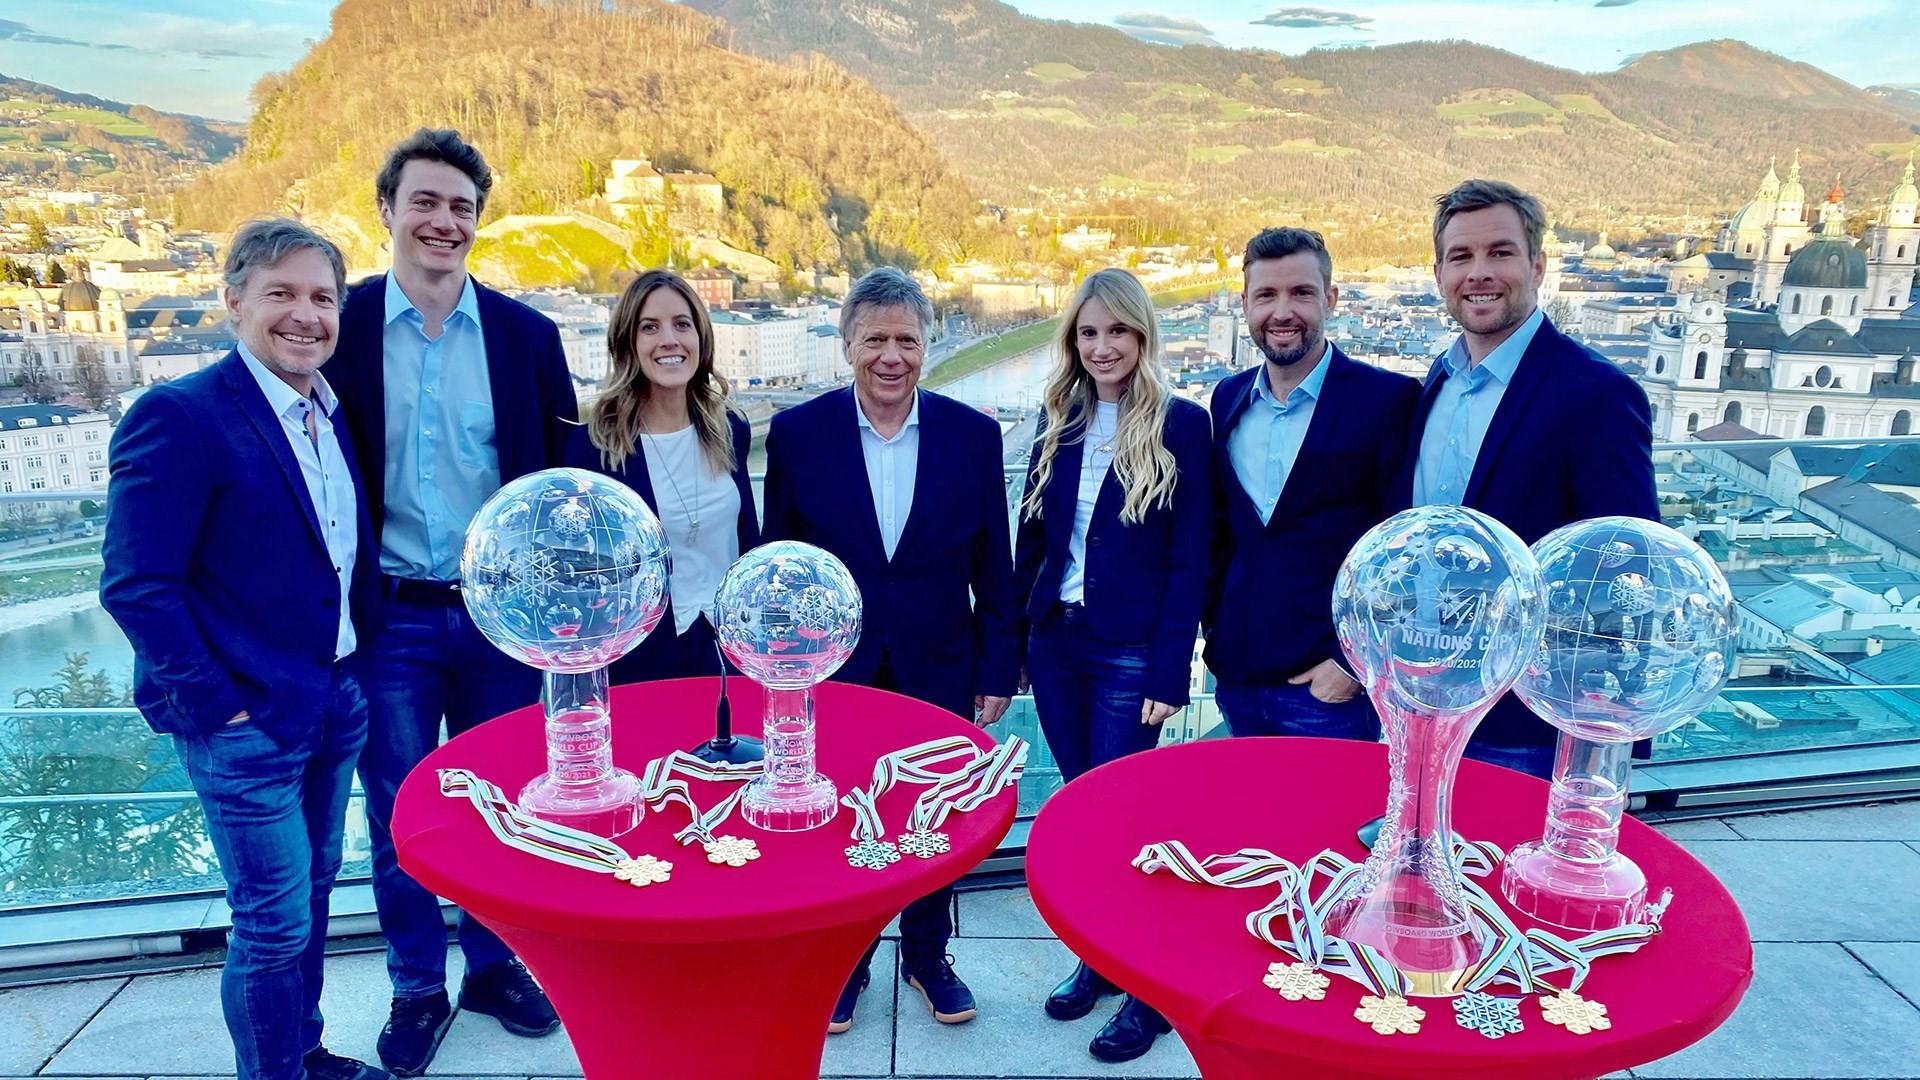 Austrian winter athletes honoured for 2020-2021 achievements